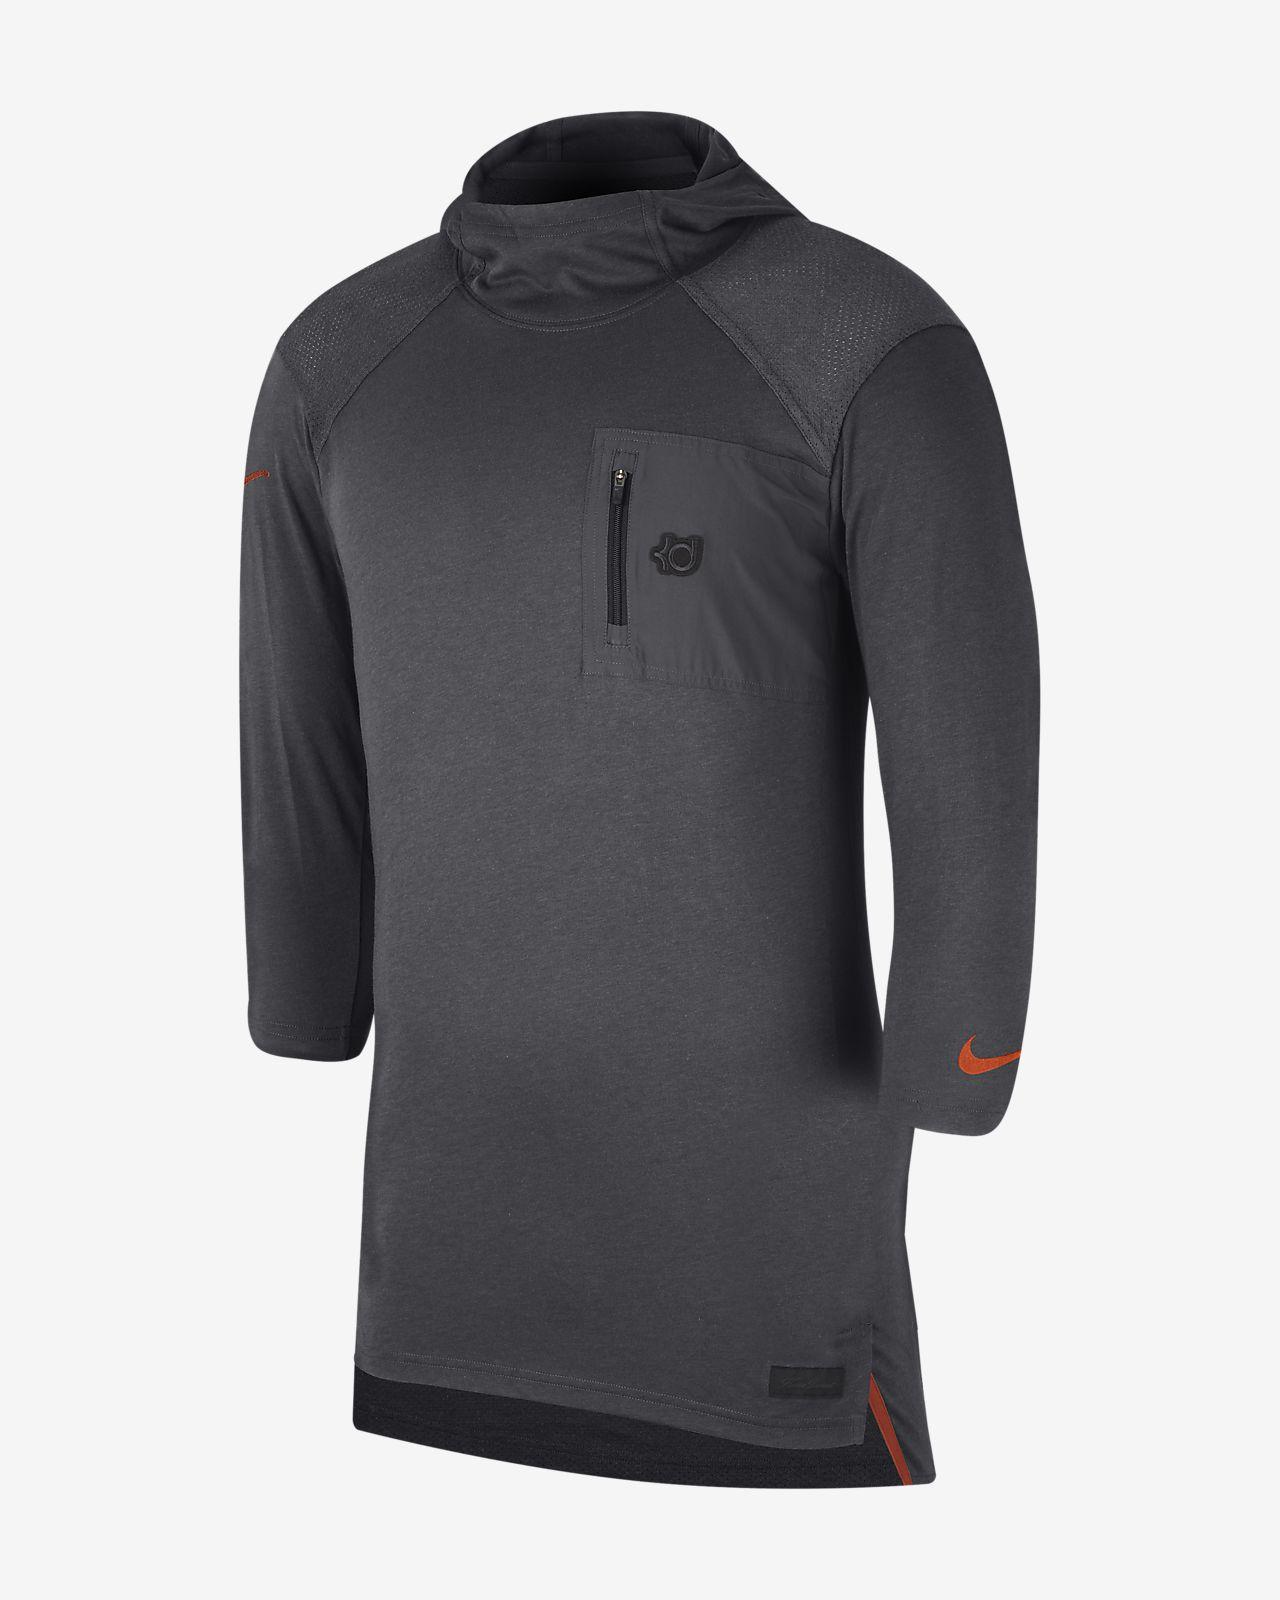 54e95c3d2 Nike College Dri-FIT KD (Texas) Men s 3 4-Sleeve Hooded Top. Nike.com